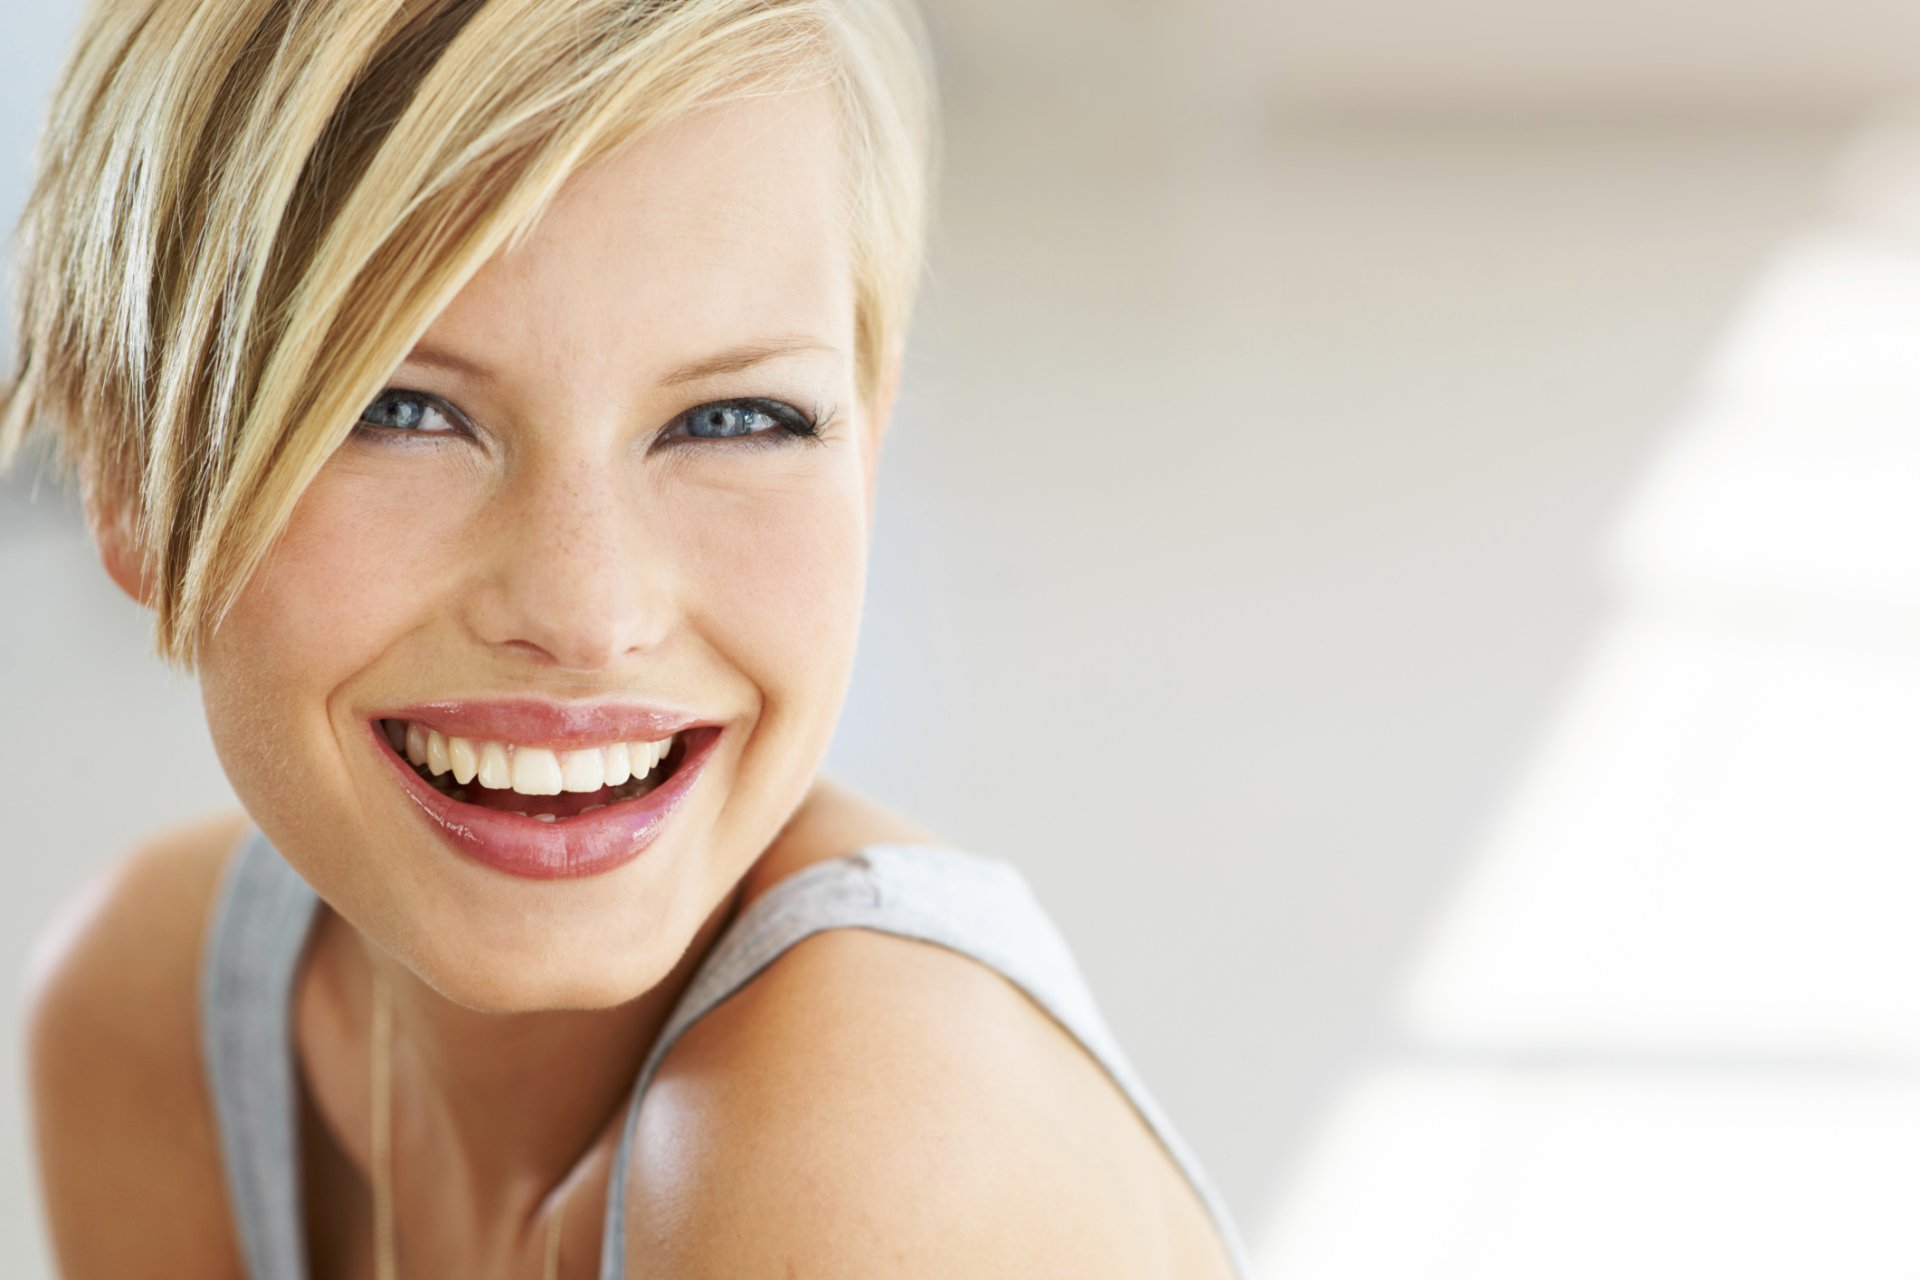 Odontobi Dental Clinic - Clinica Odontoiatrica situata tra Novara e Varese